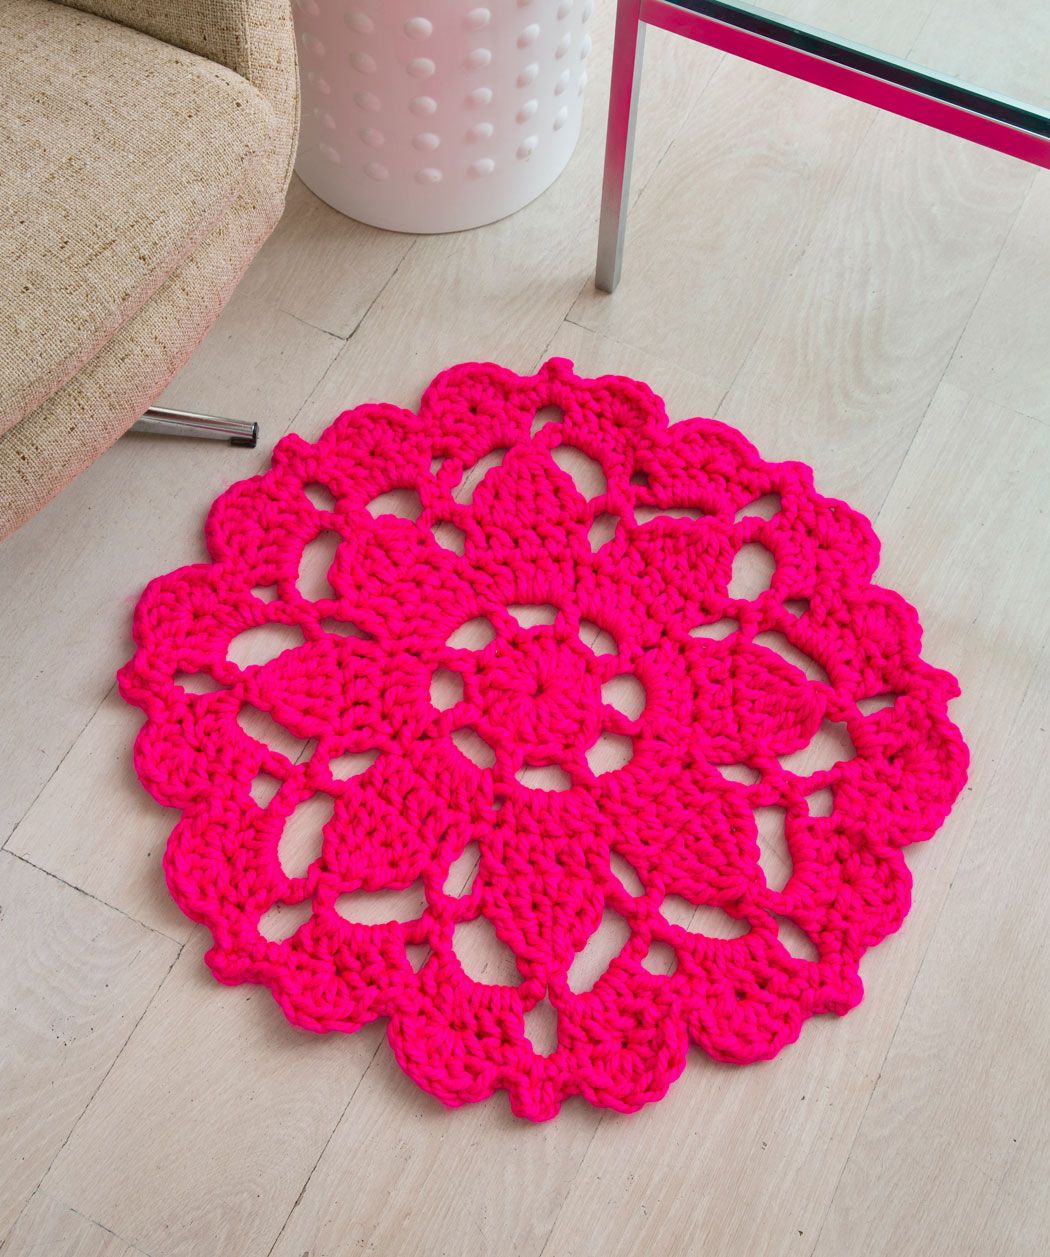 Pretty In Pink Rug Crochet Pattern Red Heart Definitely My Next